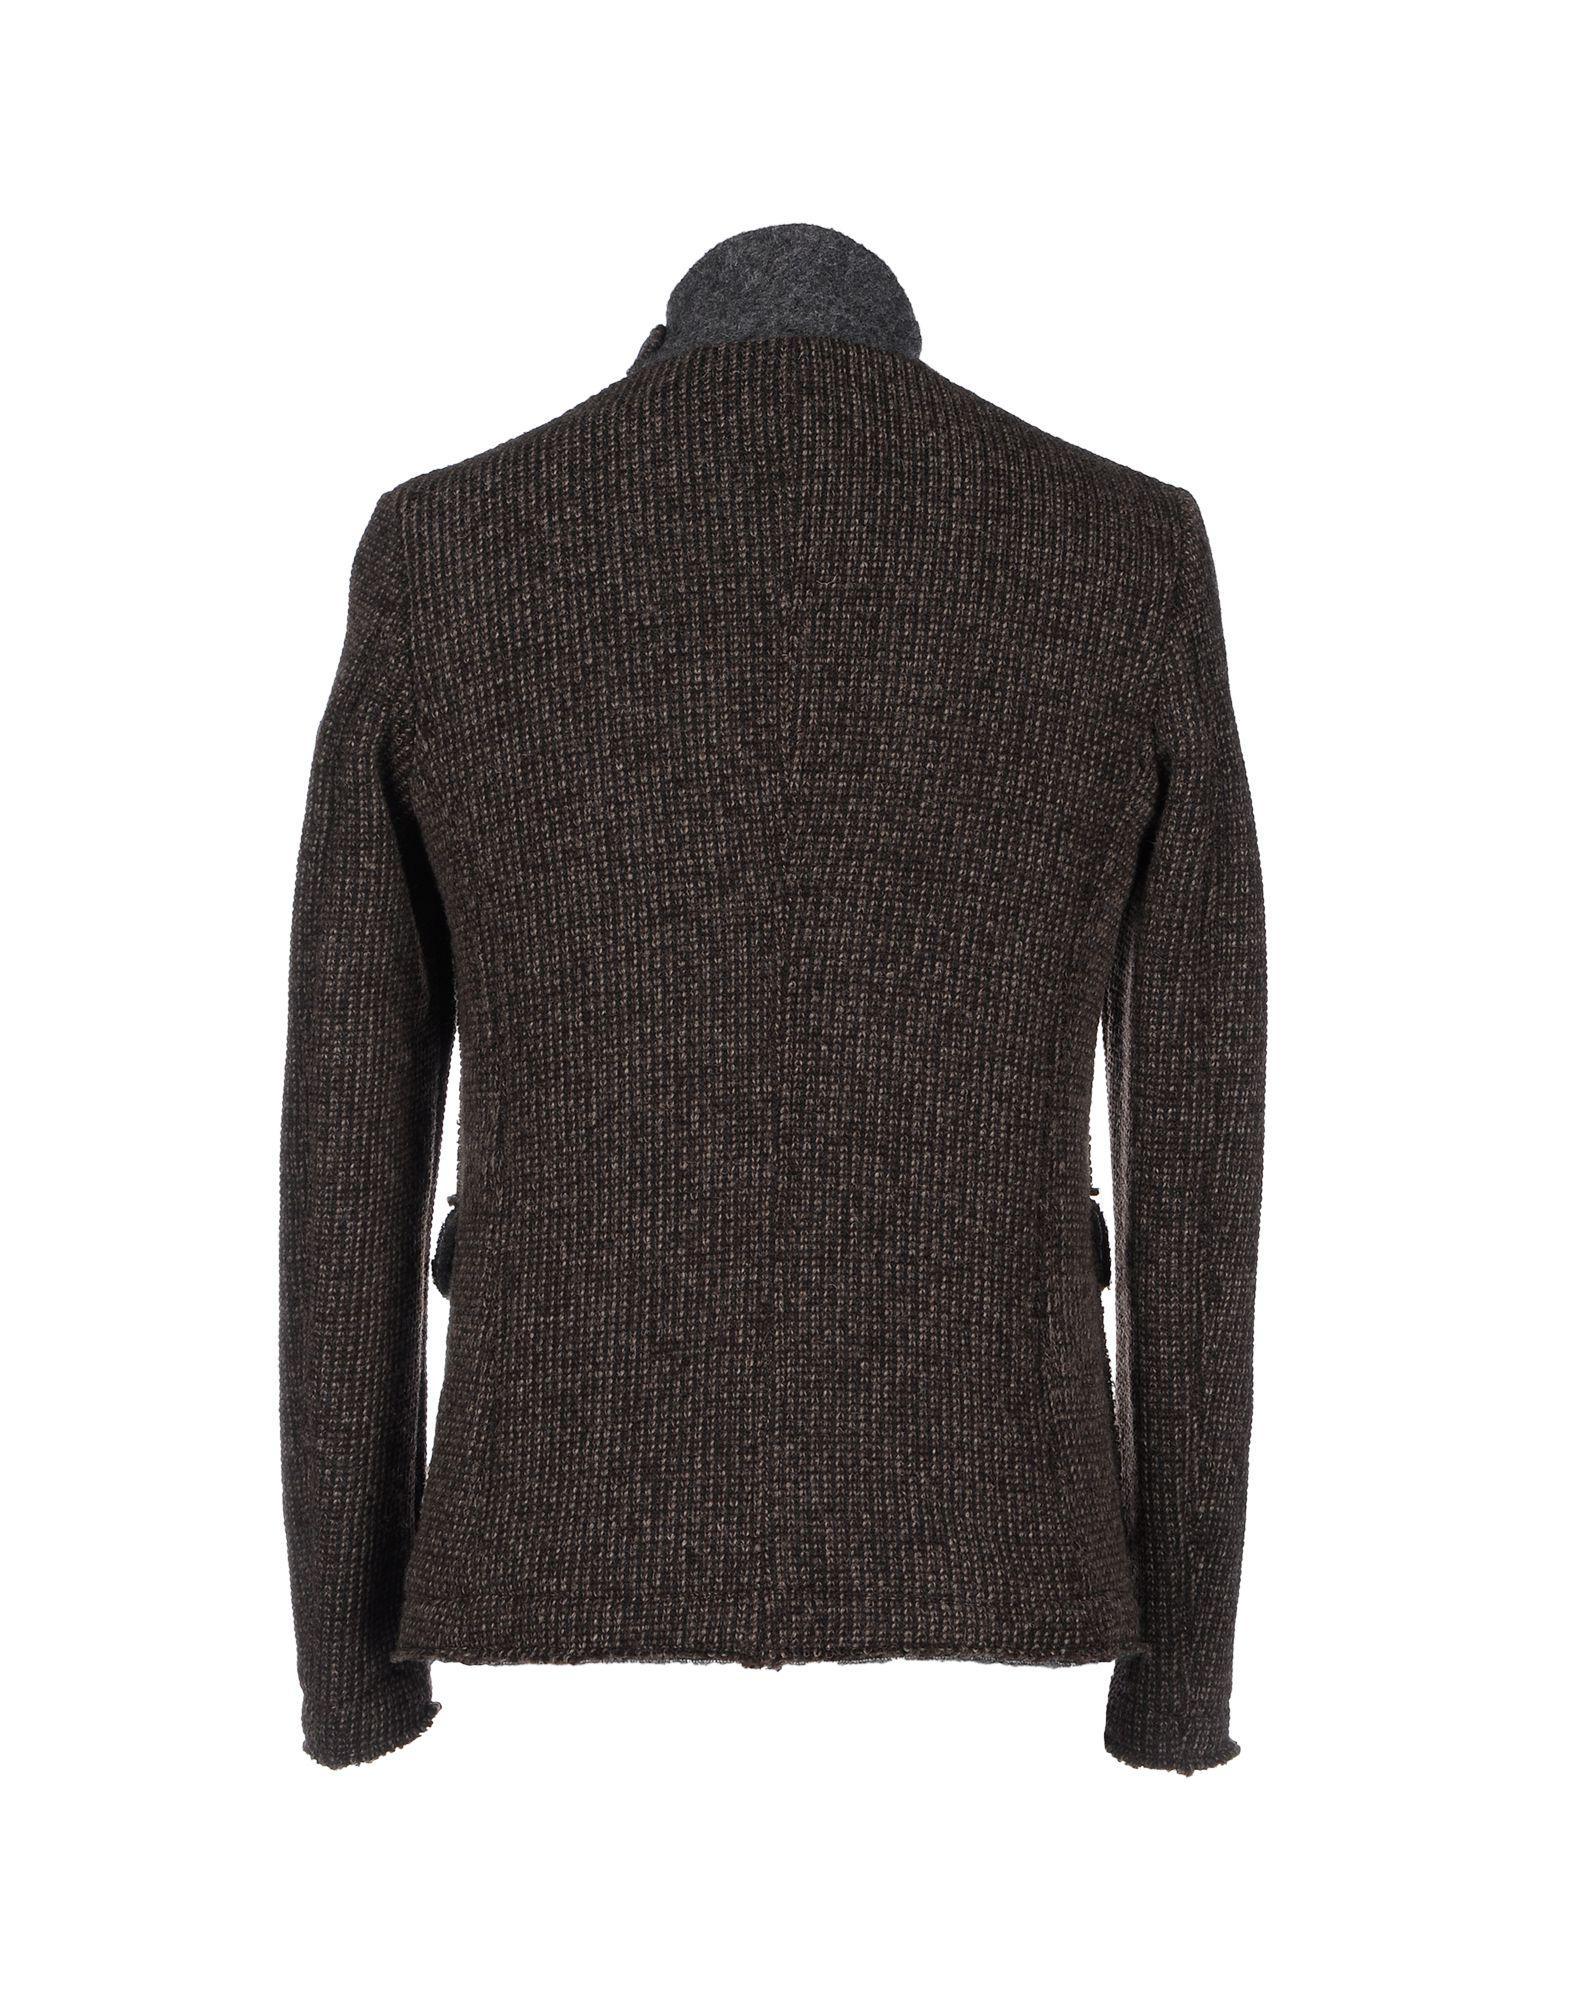 Dimattia Synthetic Jacket in Dark Brown (Brown) for Men